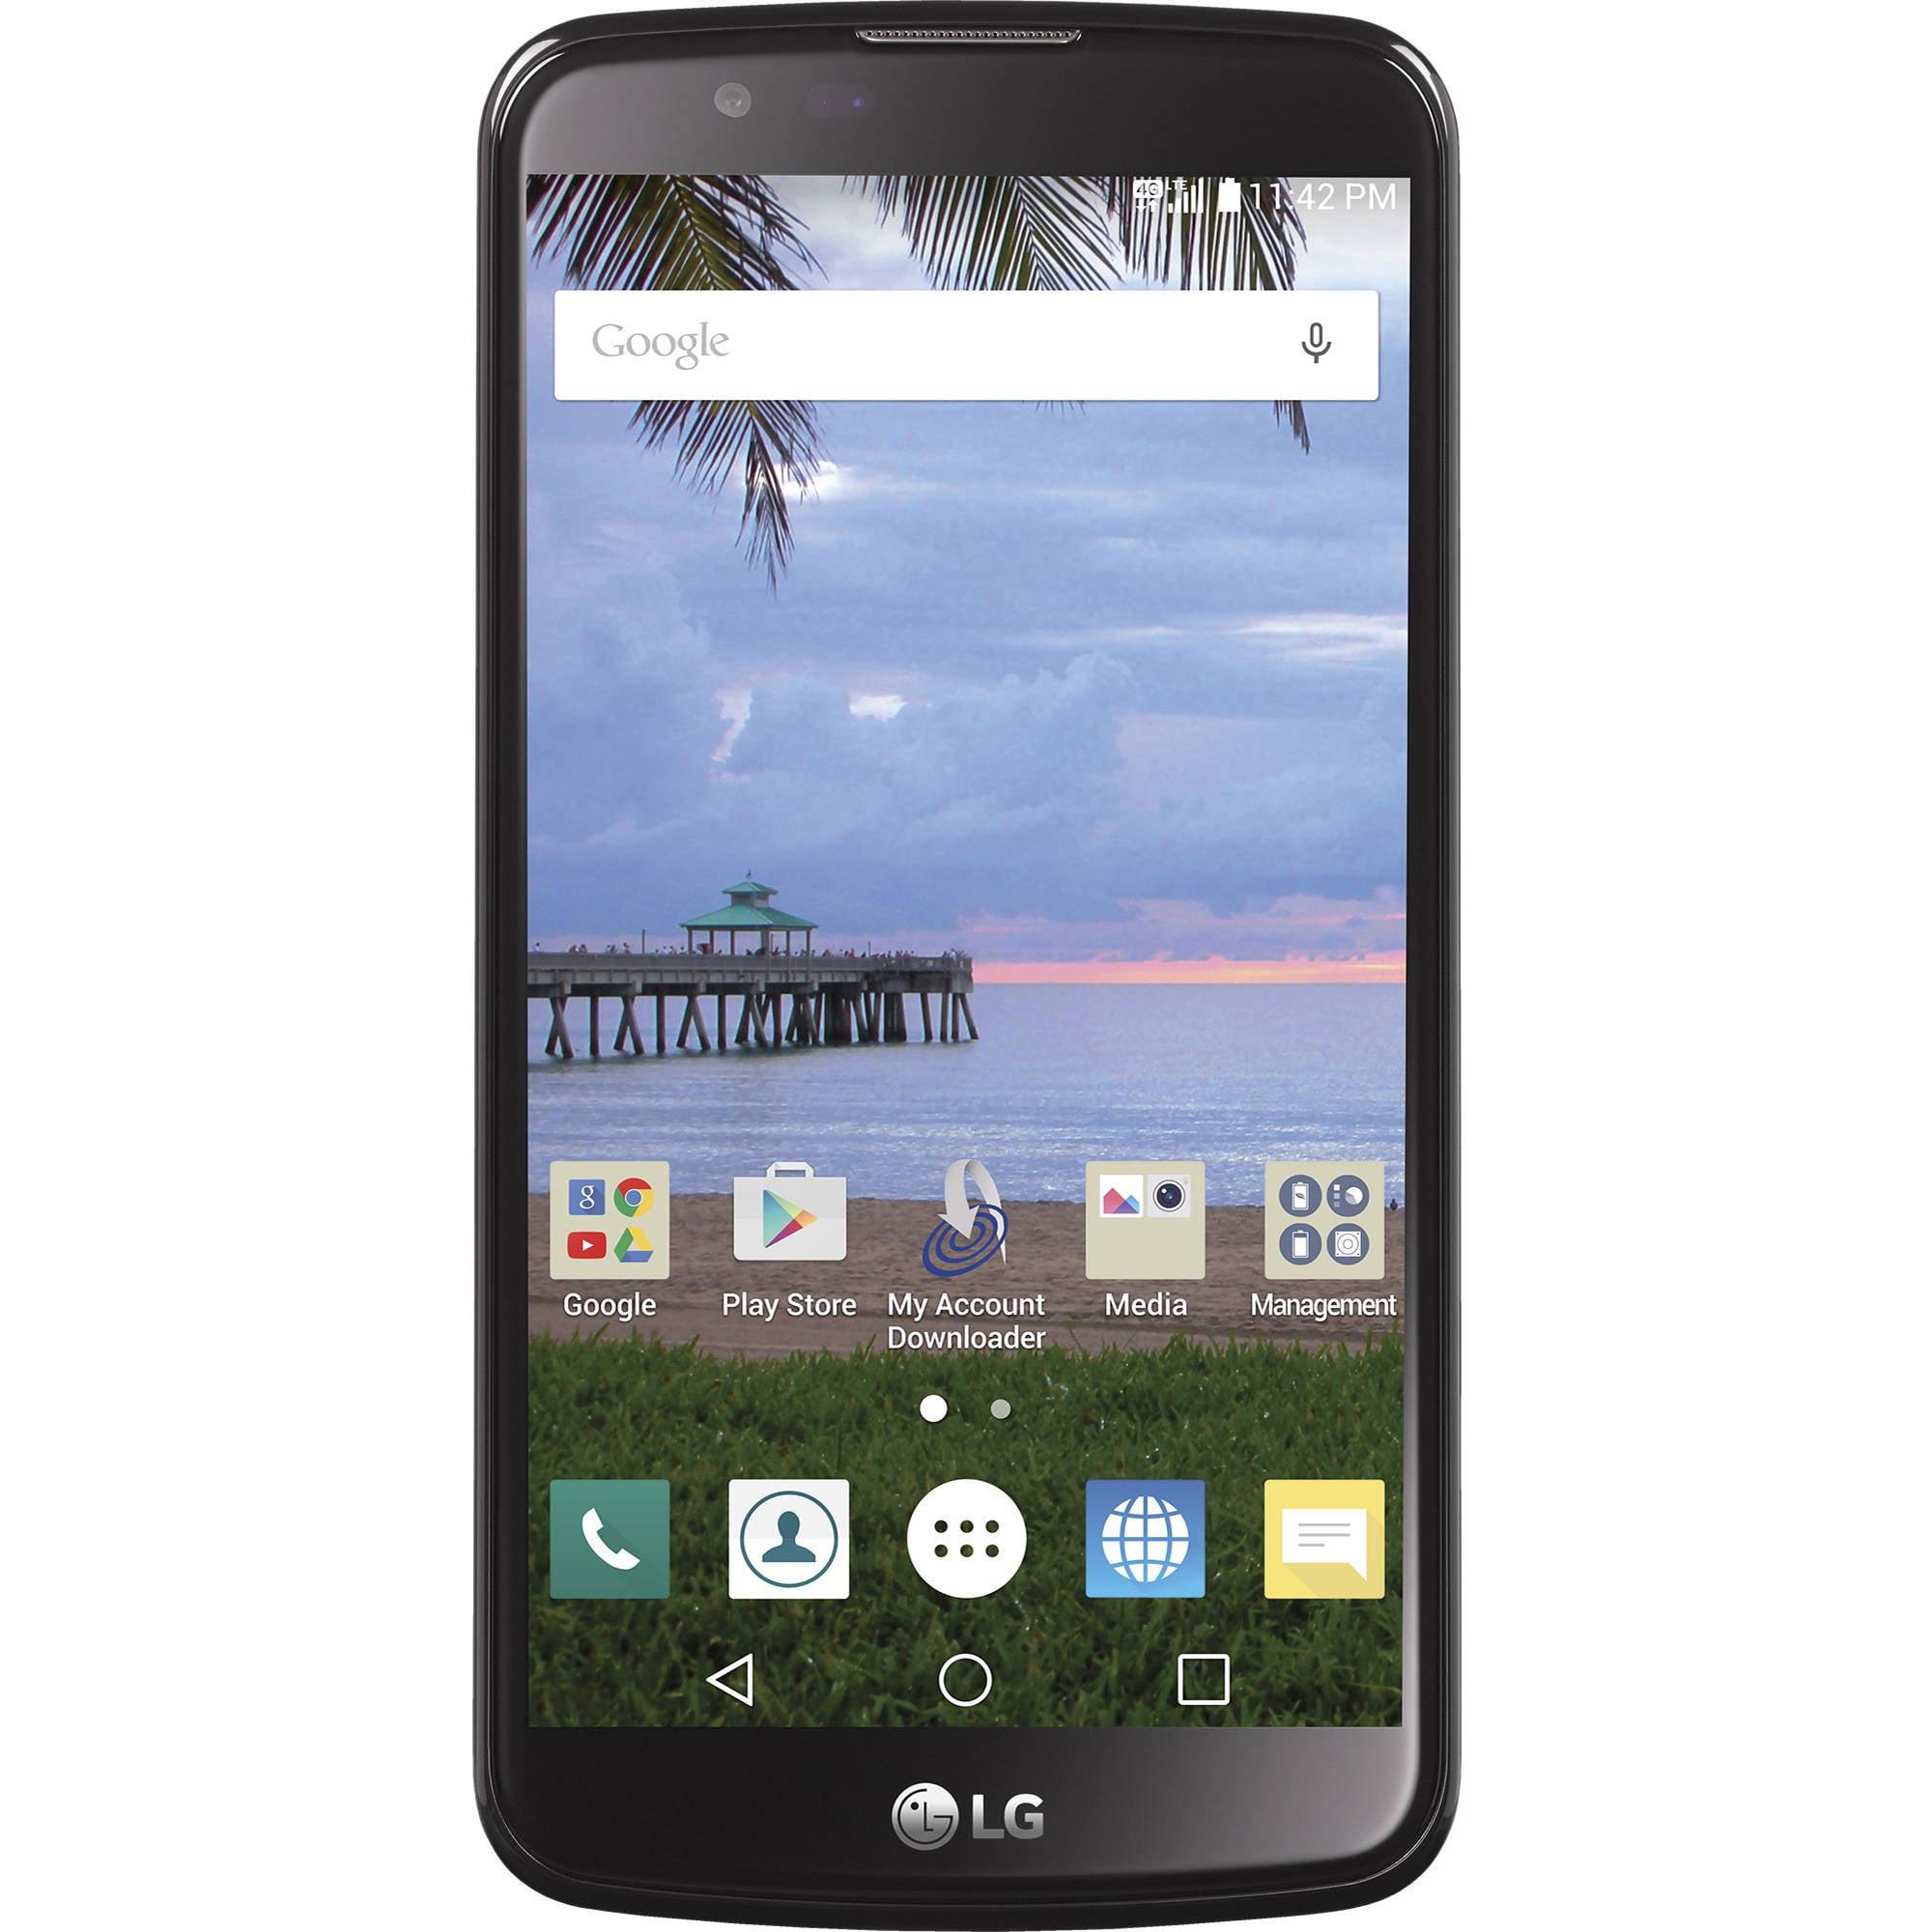 Tracfone Wireless Total Wireless LG Premier 4G LTE Cdma P...